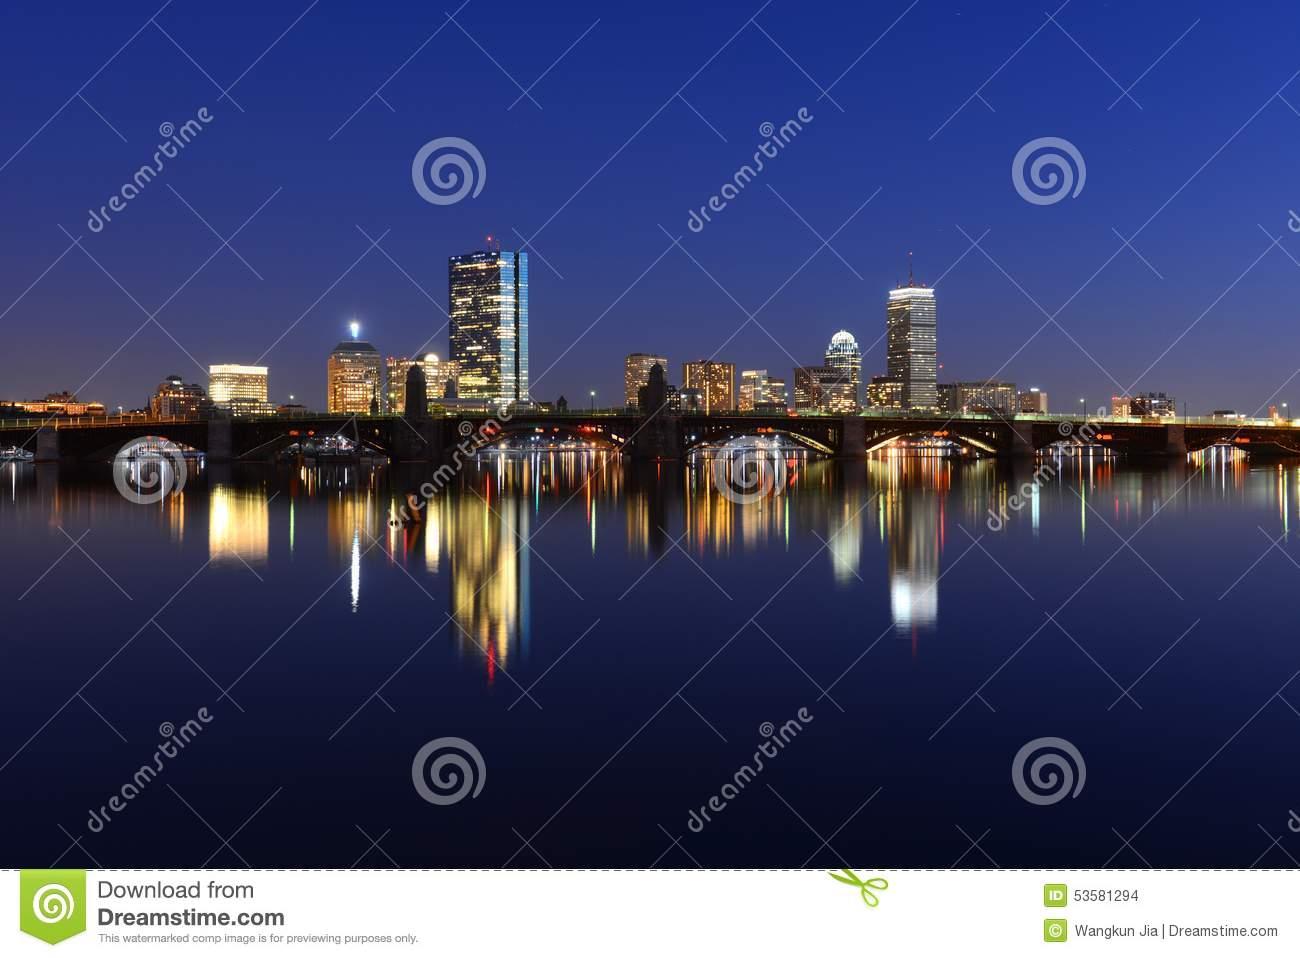 Boston Charles River And Back Bay Skyline At Night Stock Photo.